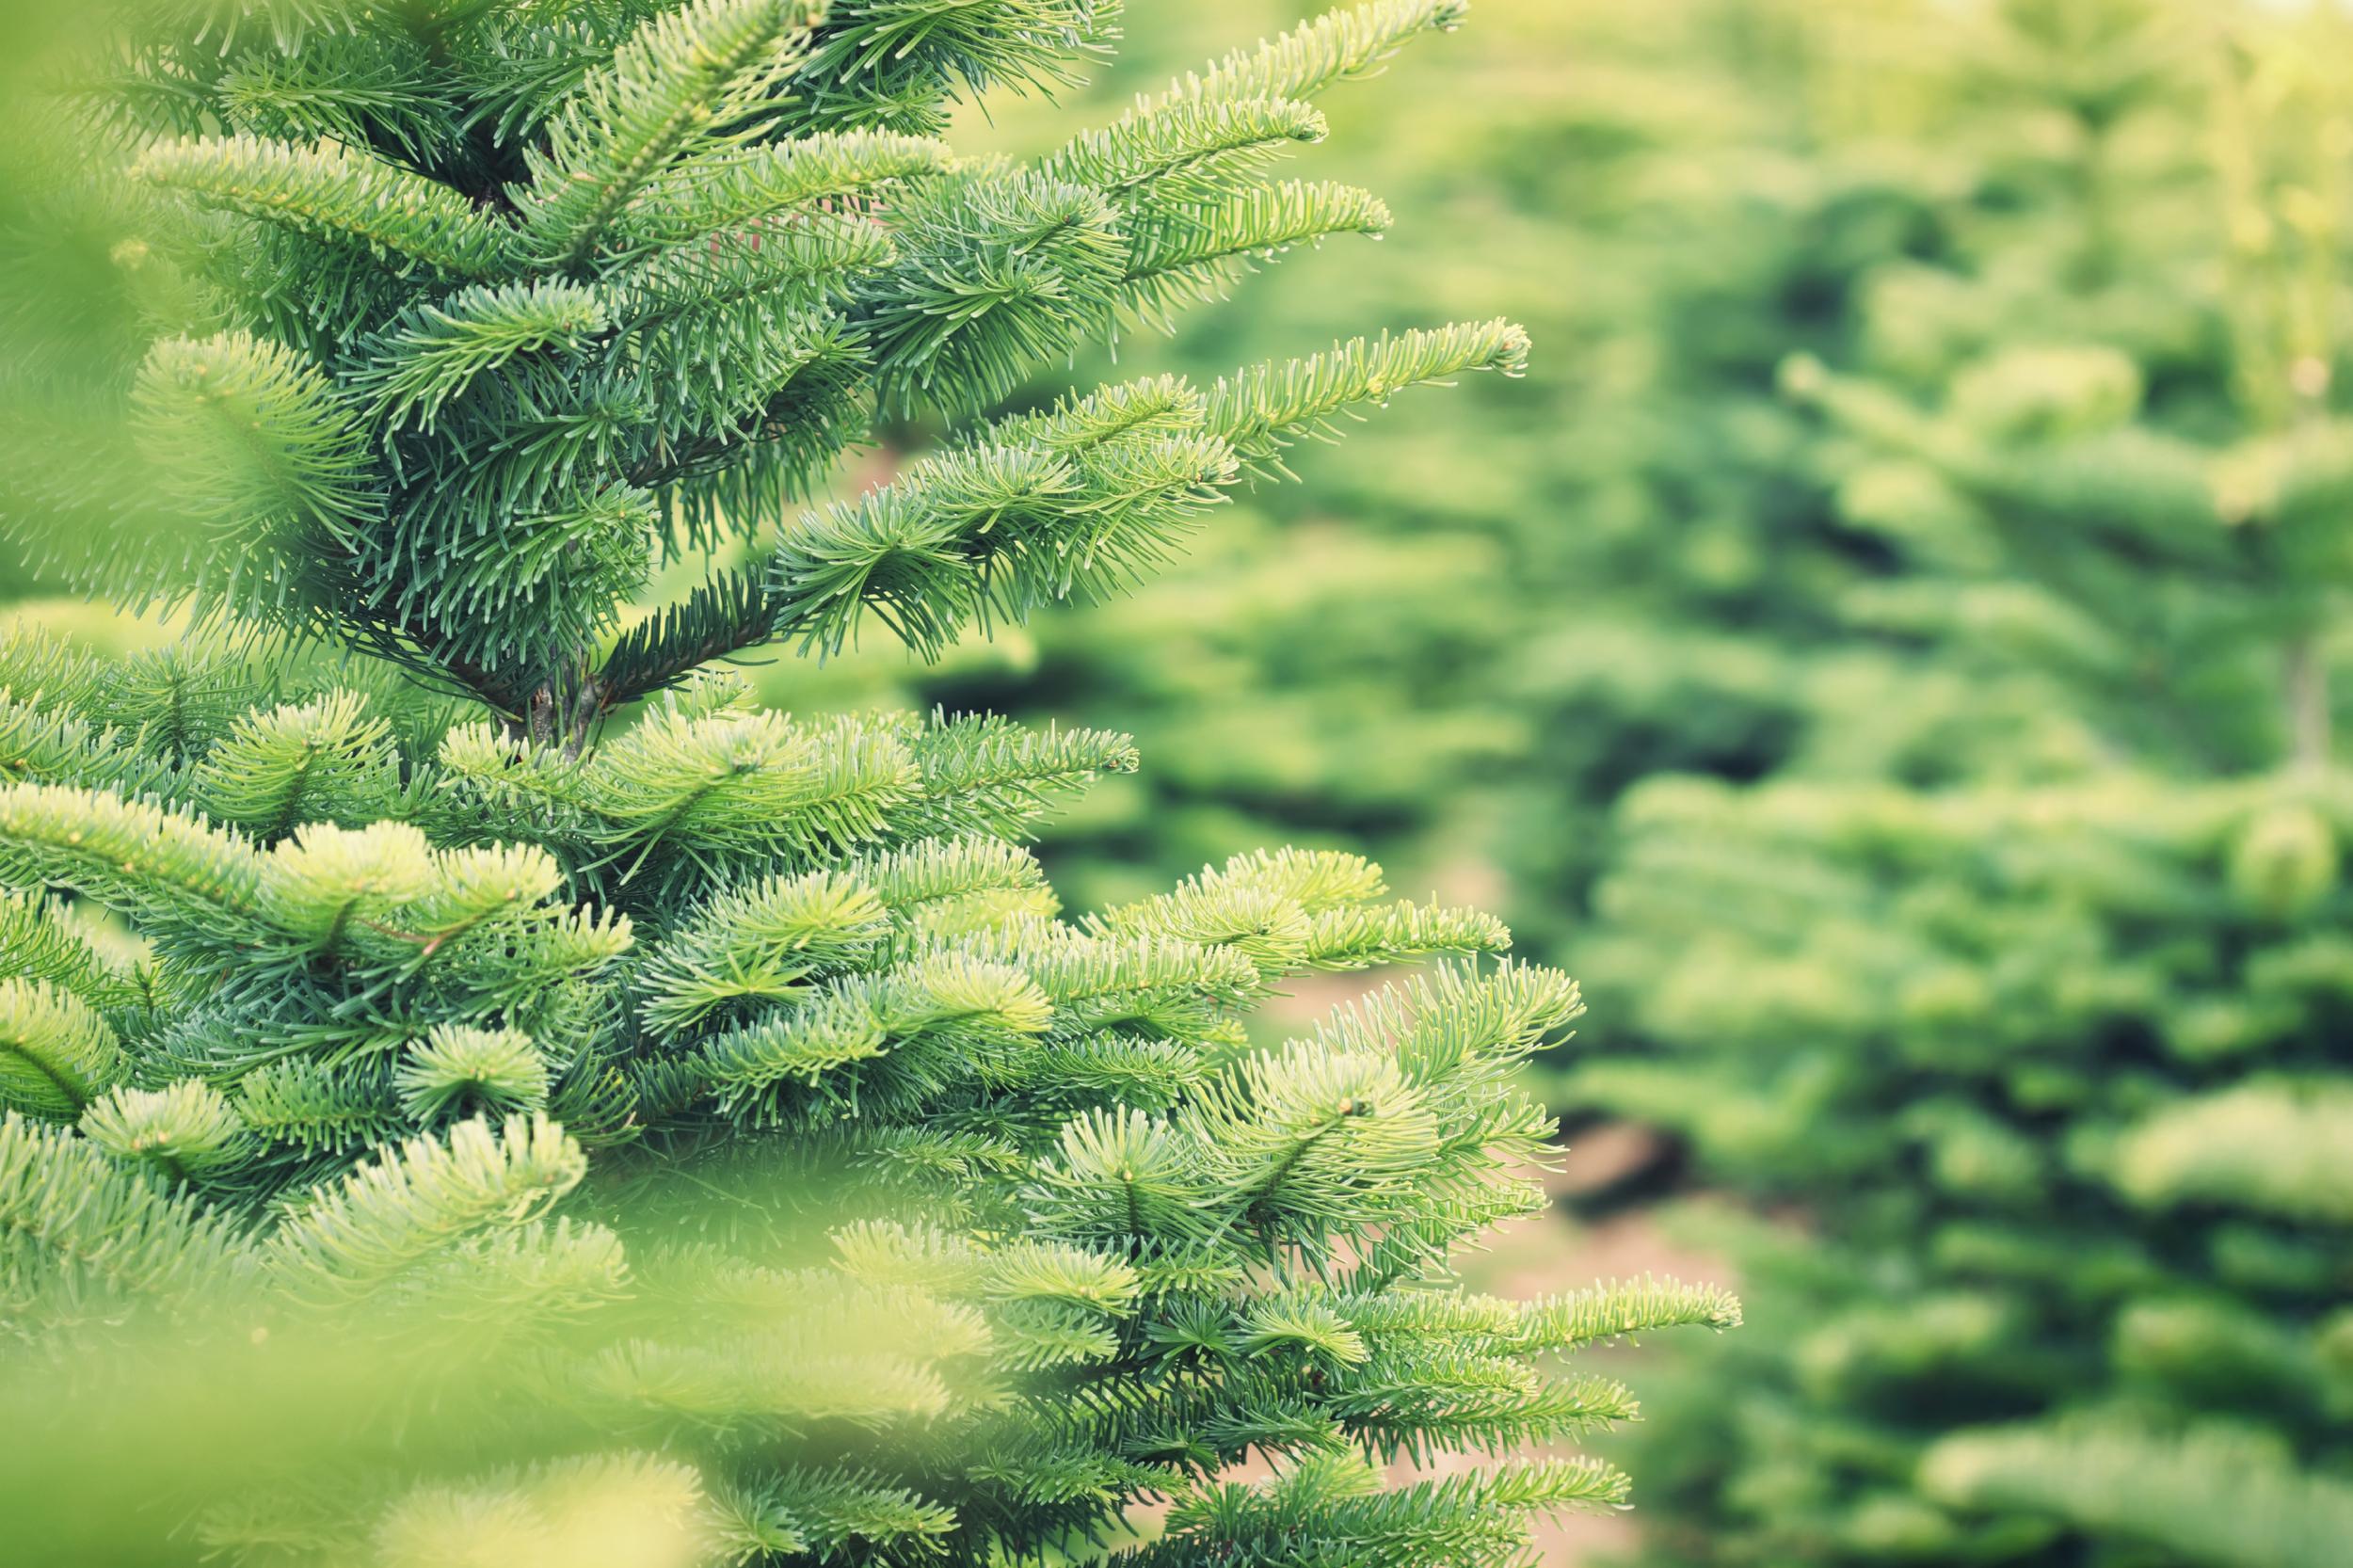 Holiday Christmas Tree 17423590_Large.jpg